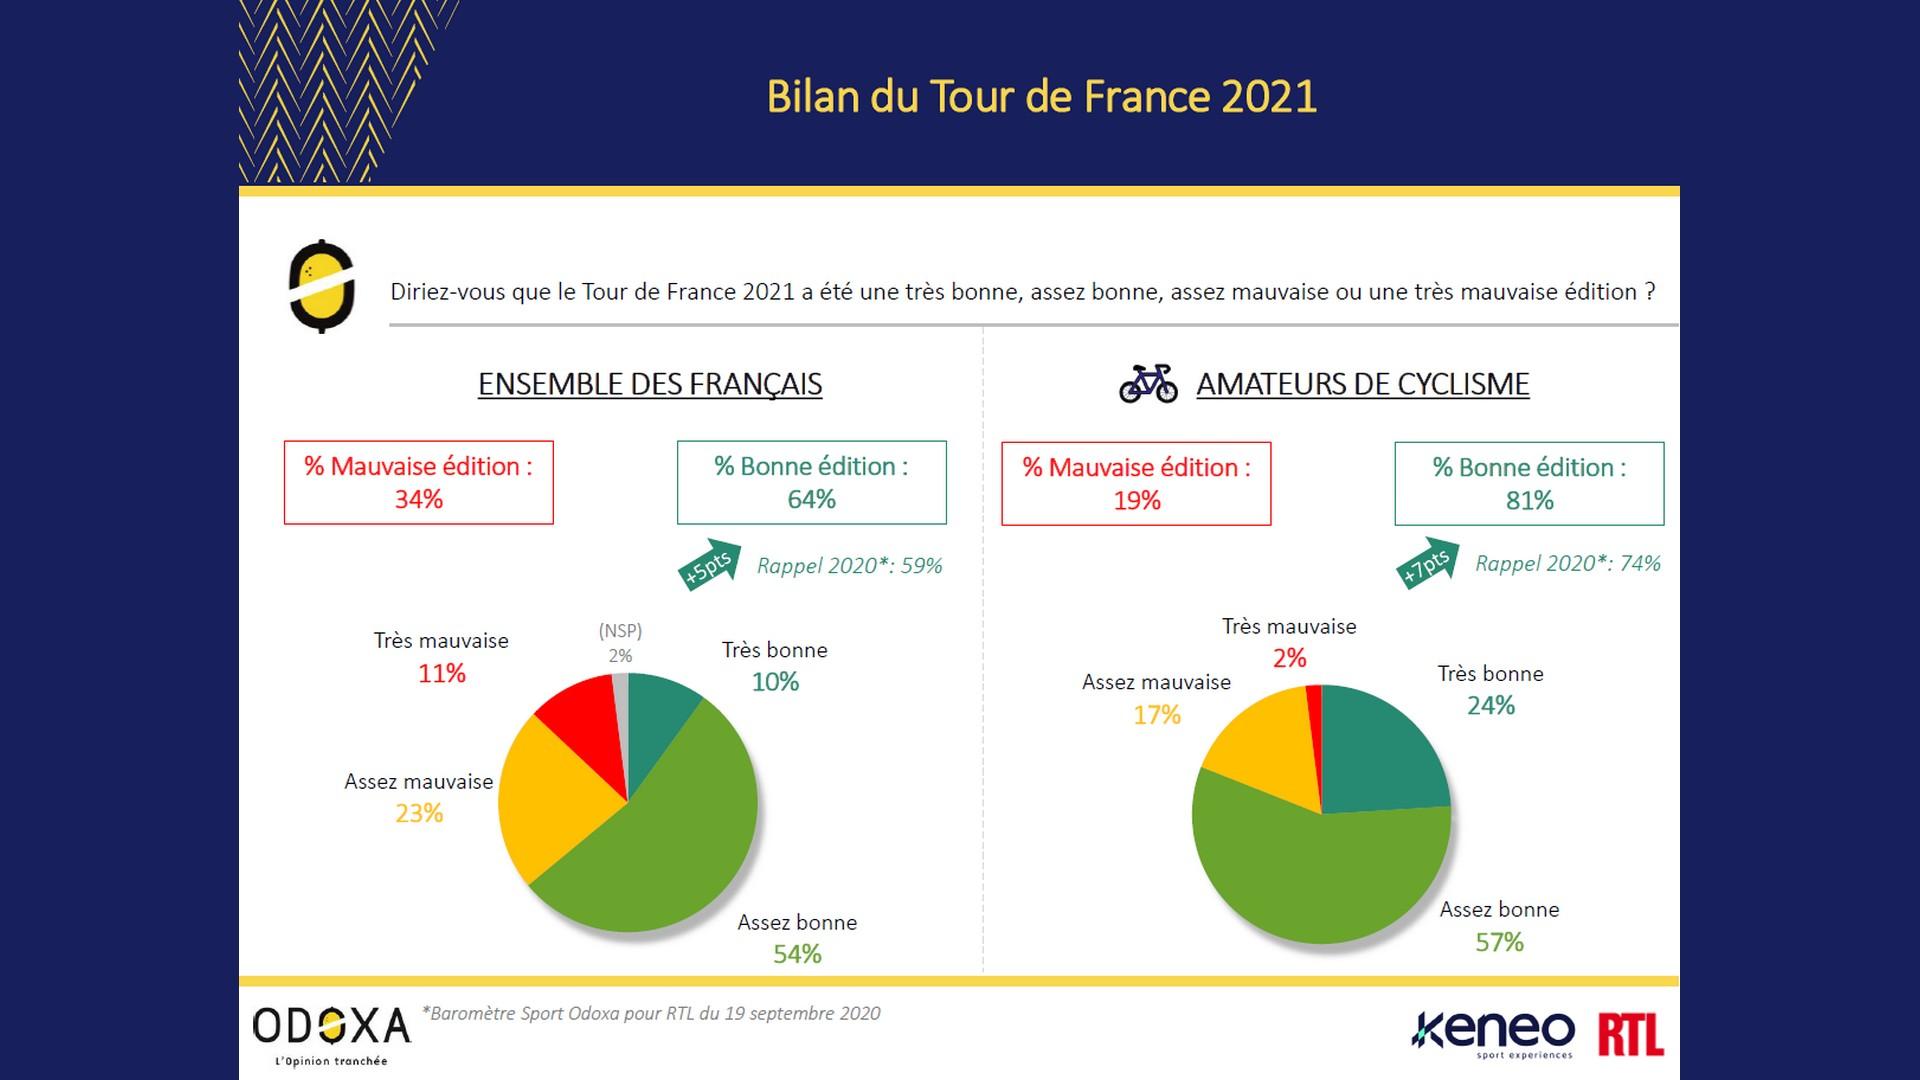 Cyclisme – Odoxa bilan Tour de France 2021